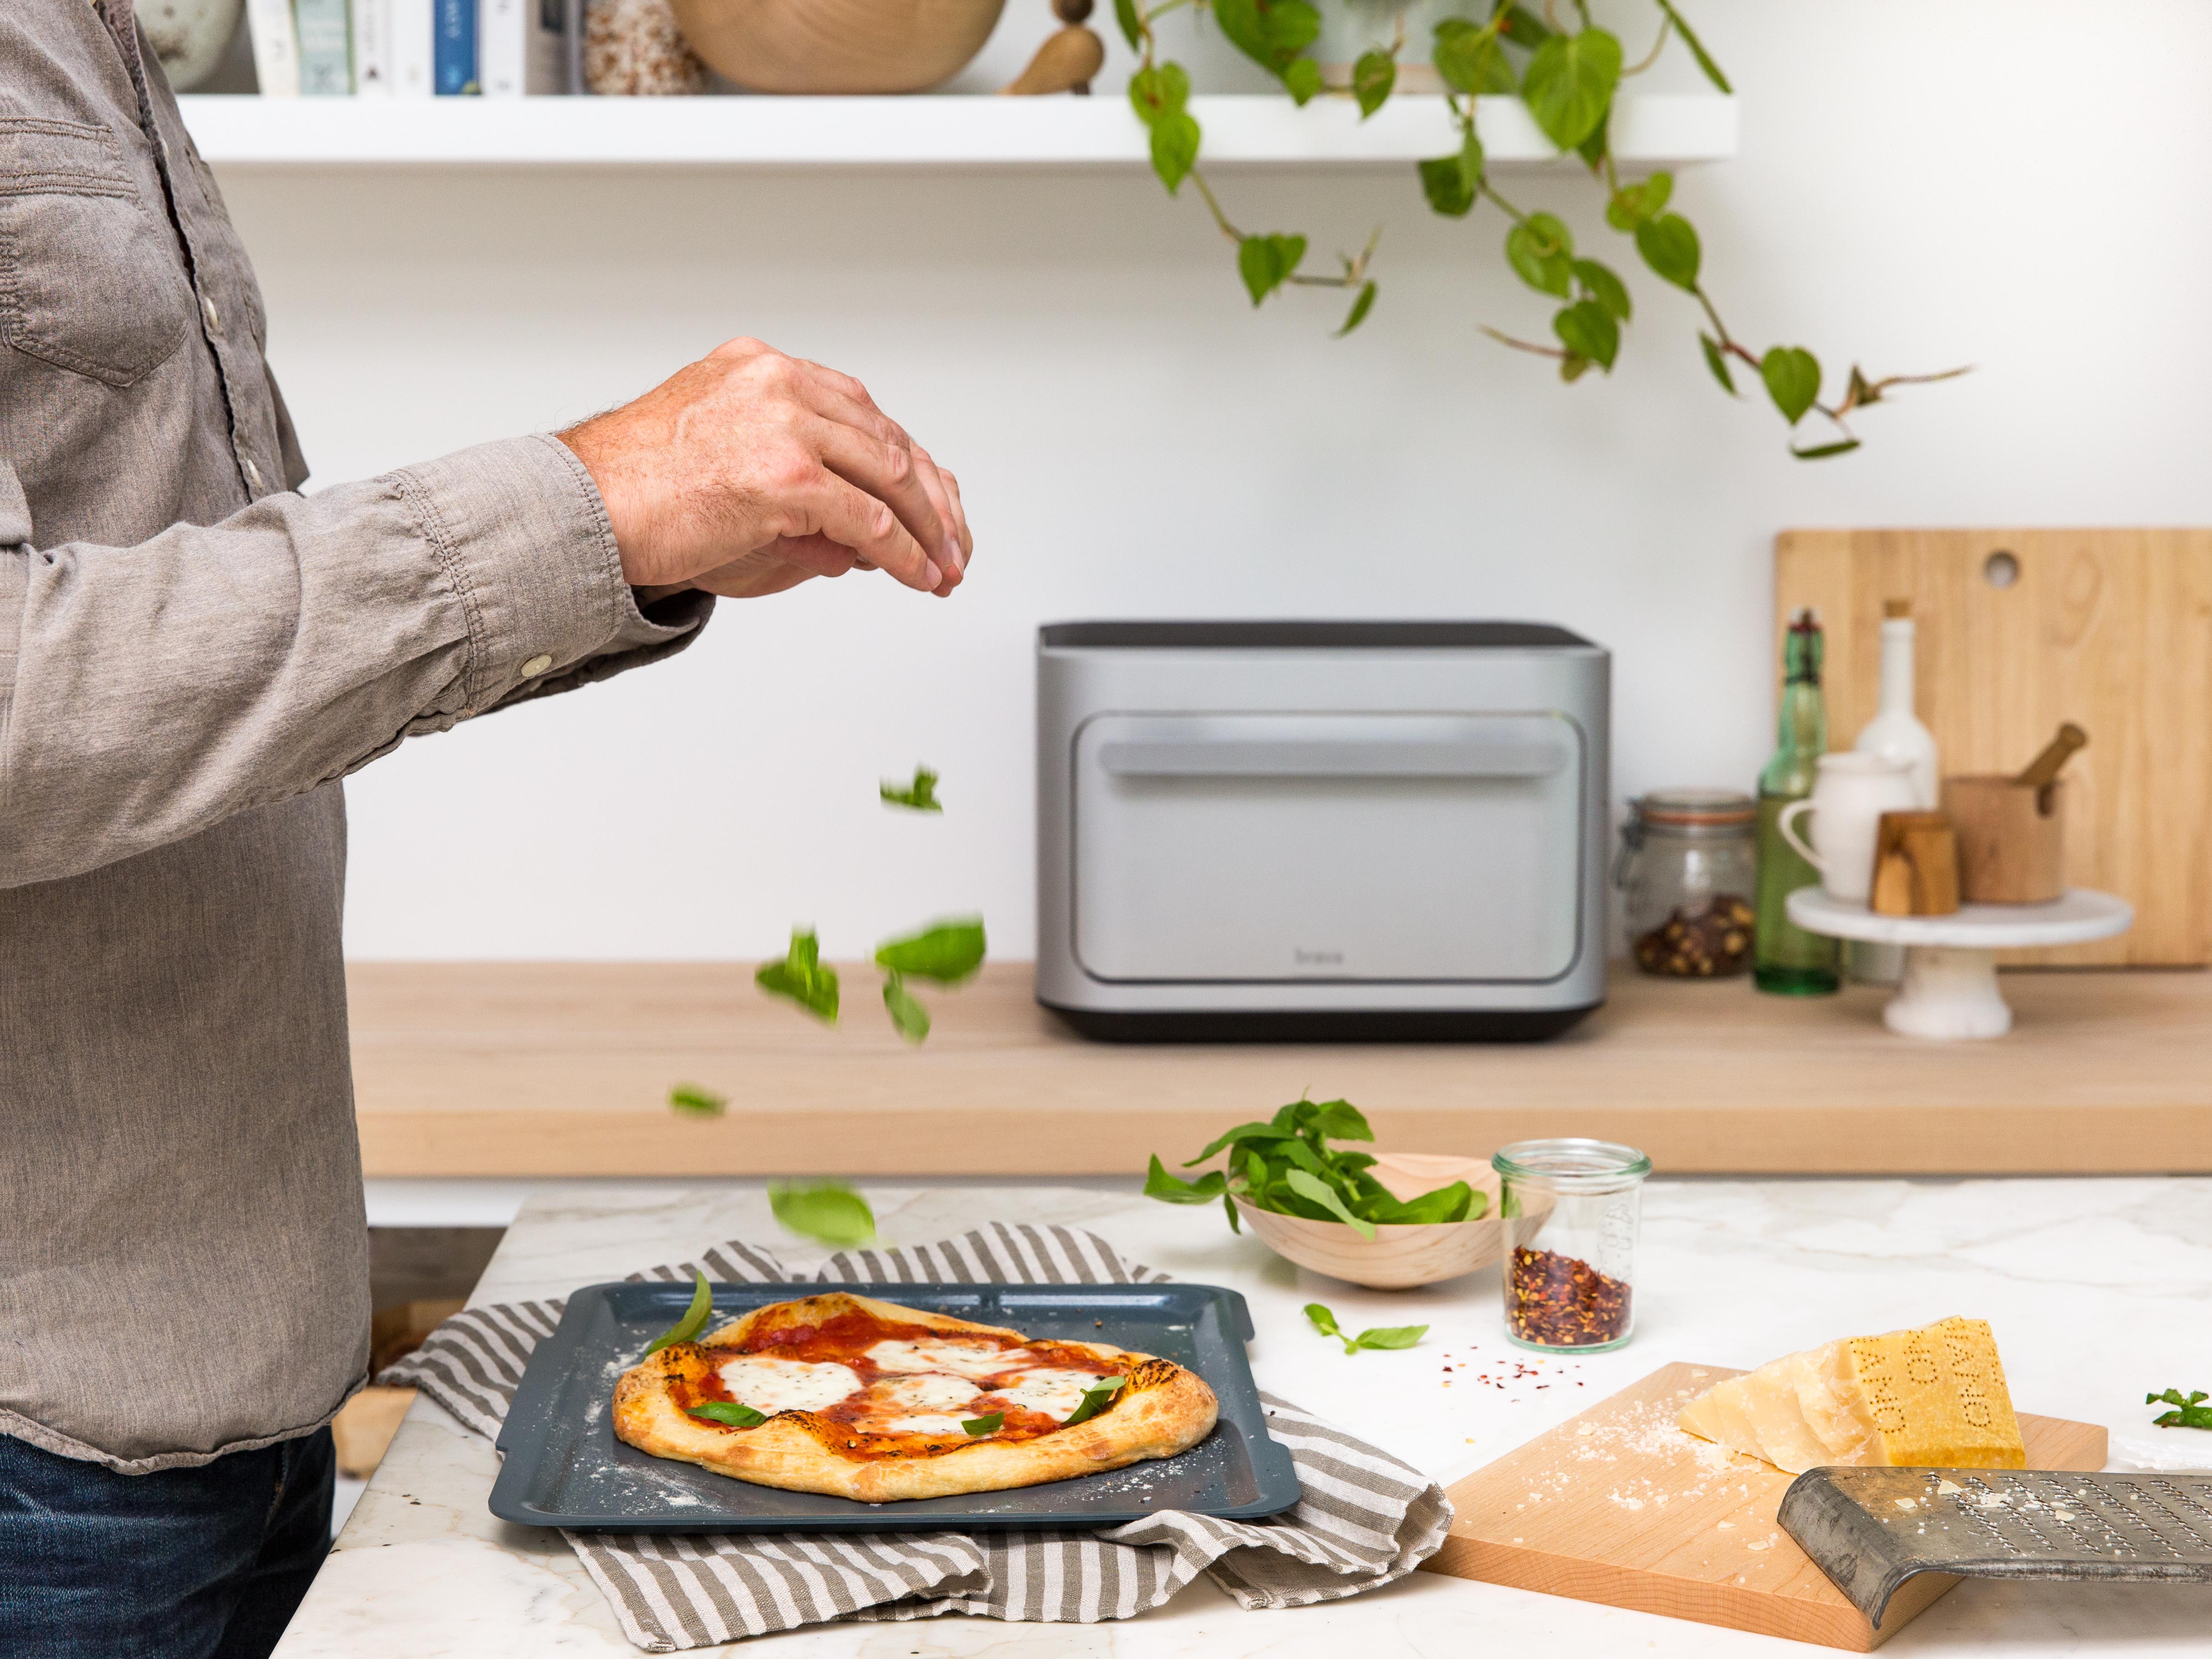 The Best Kitchen Gadgets of 2018 - Sunset Magazine